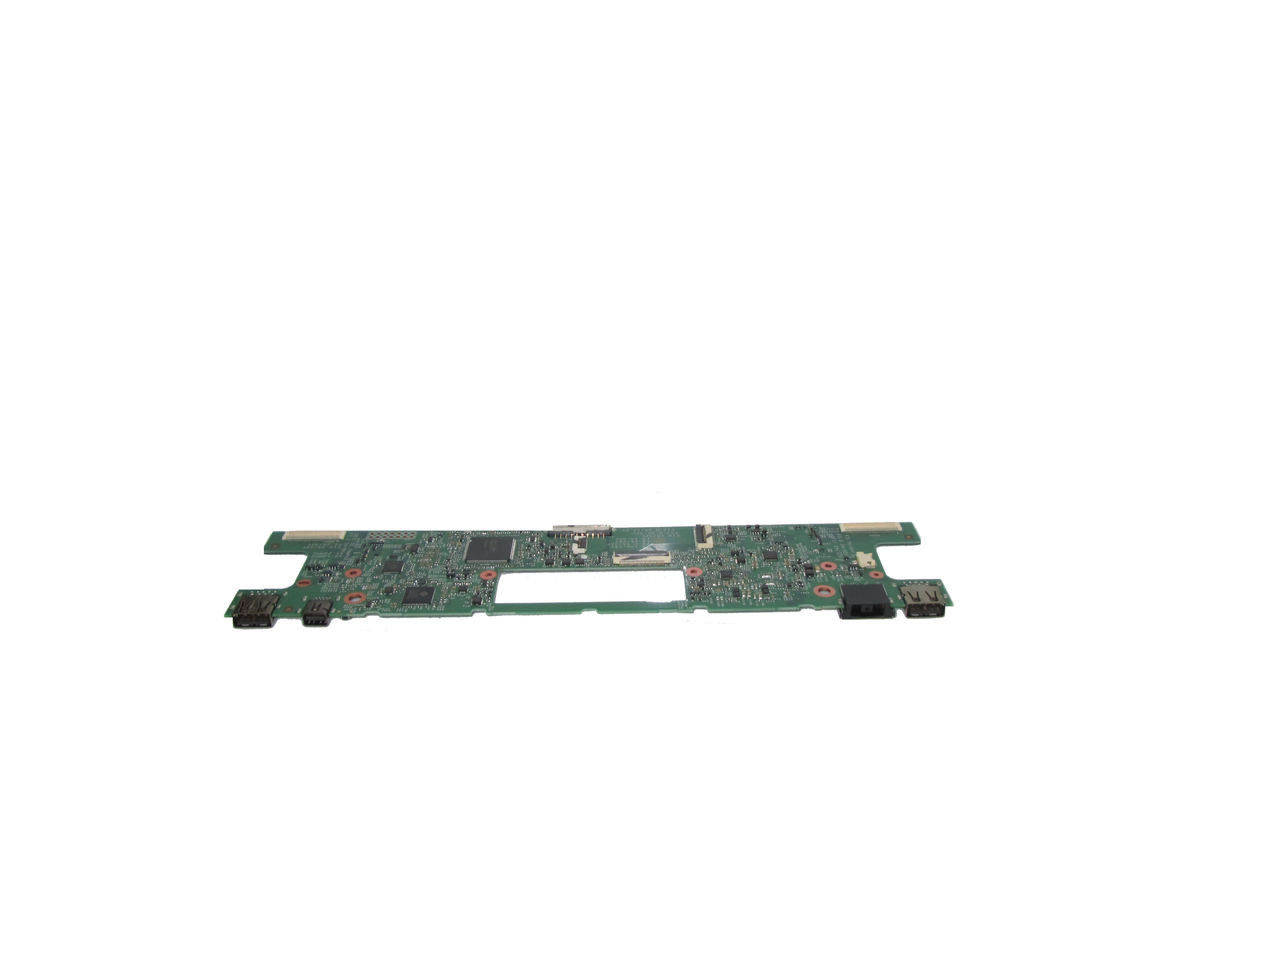 Lenovo ThinkPad X1 Helix USB Power DC In Main Board 554WW0